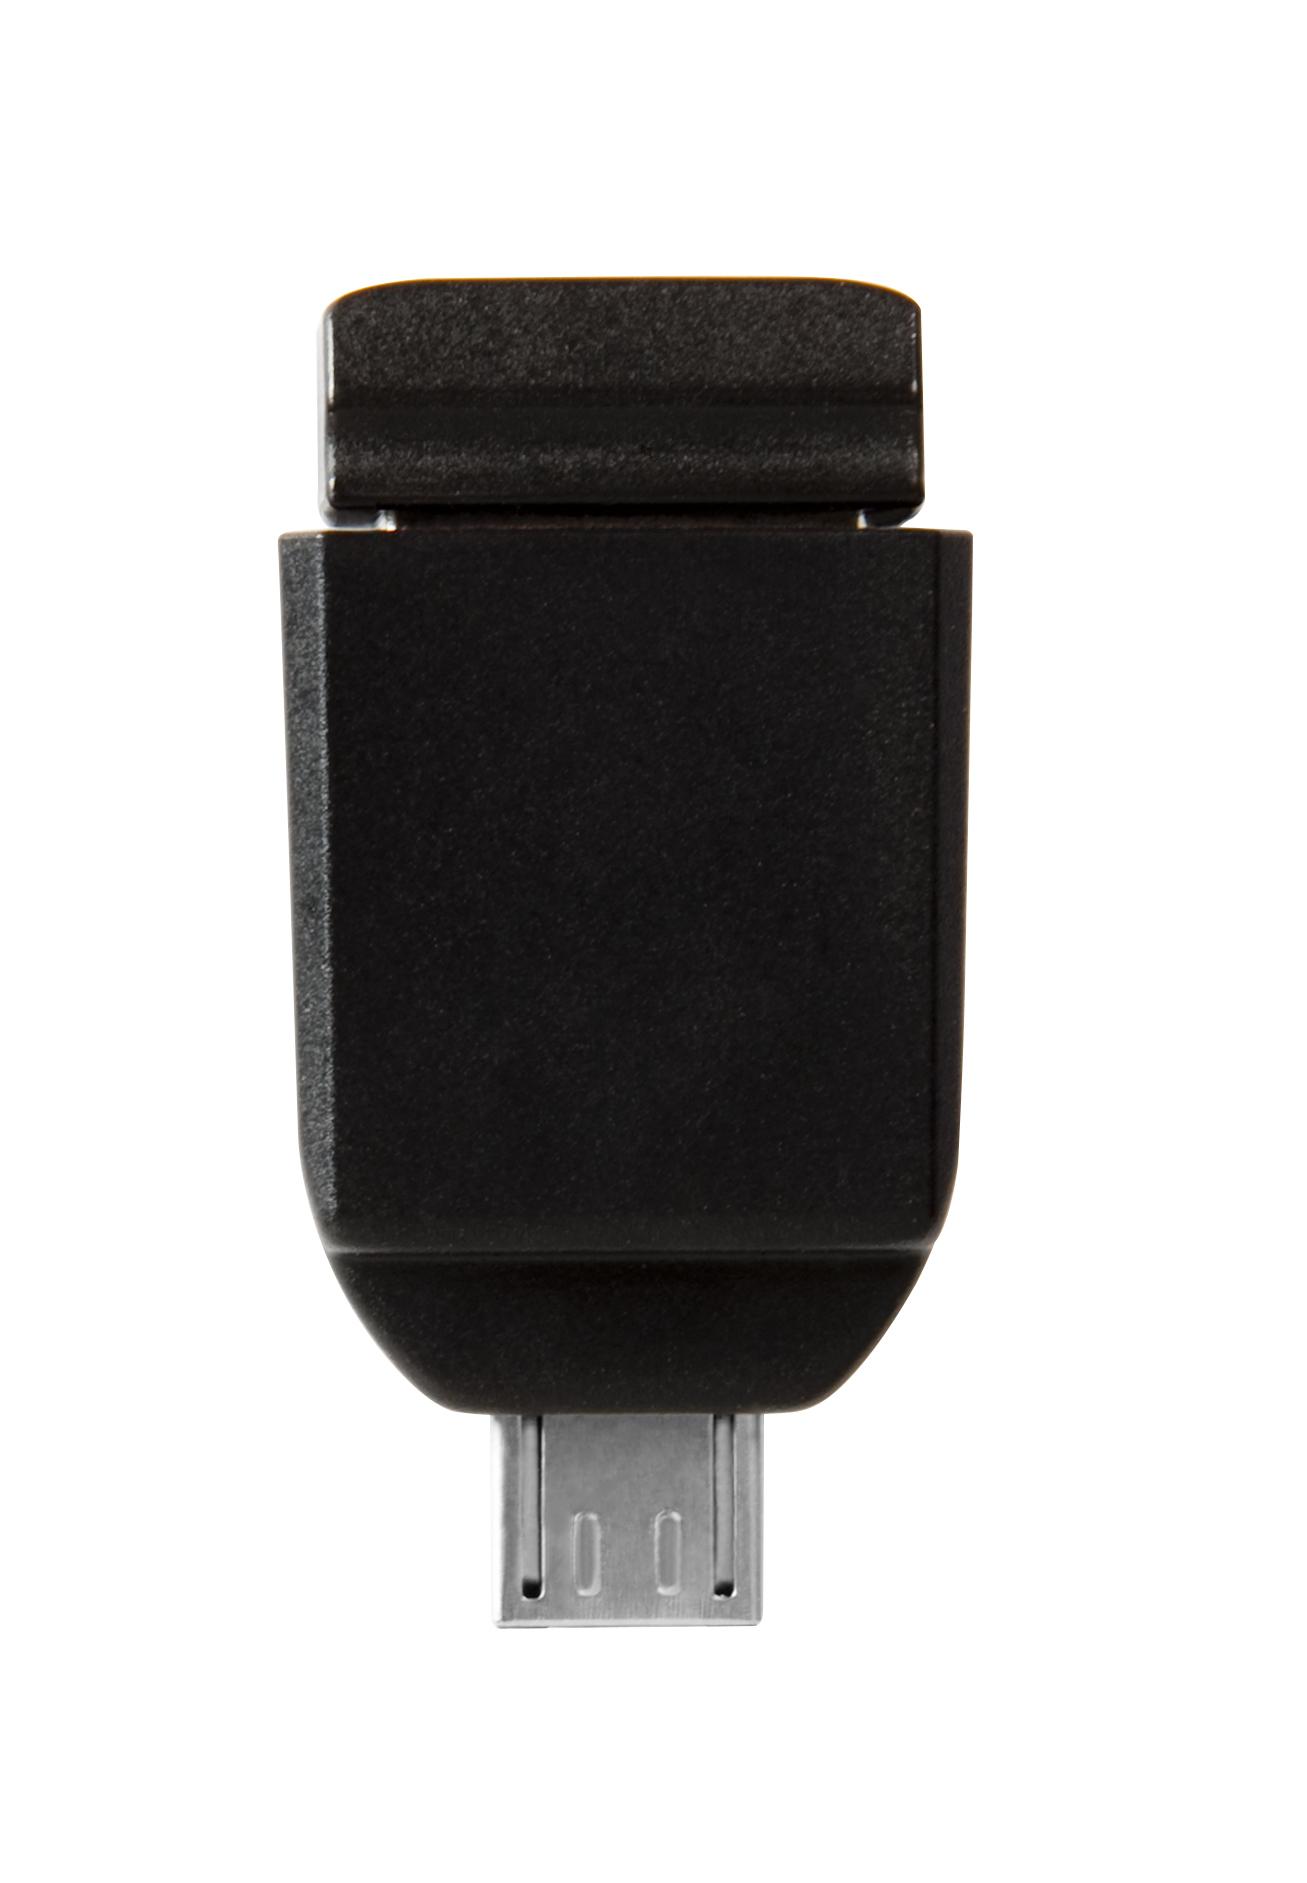 Store 'n' Go Nano USB Drive 16 GB (USB 2.0)